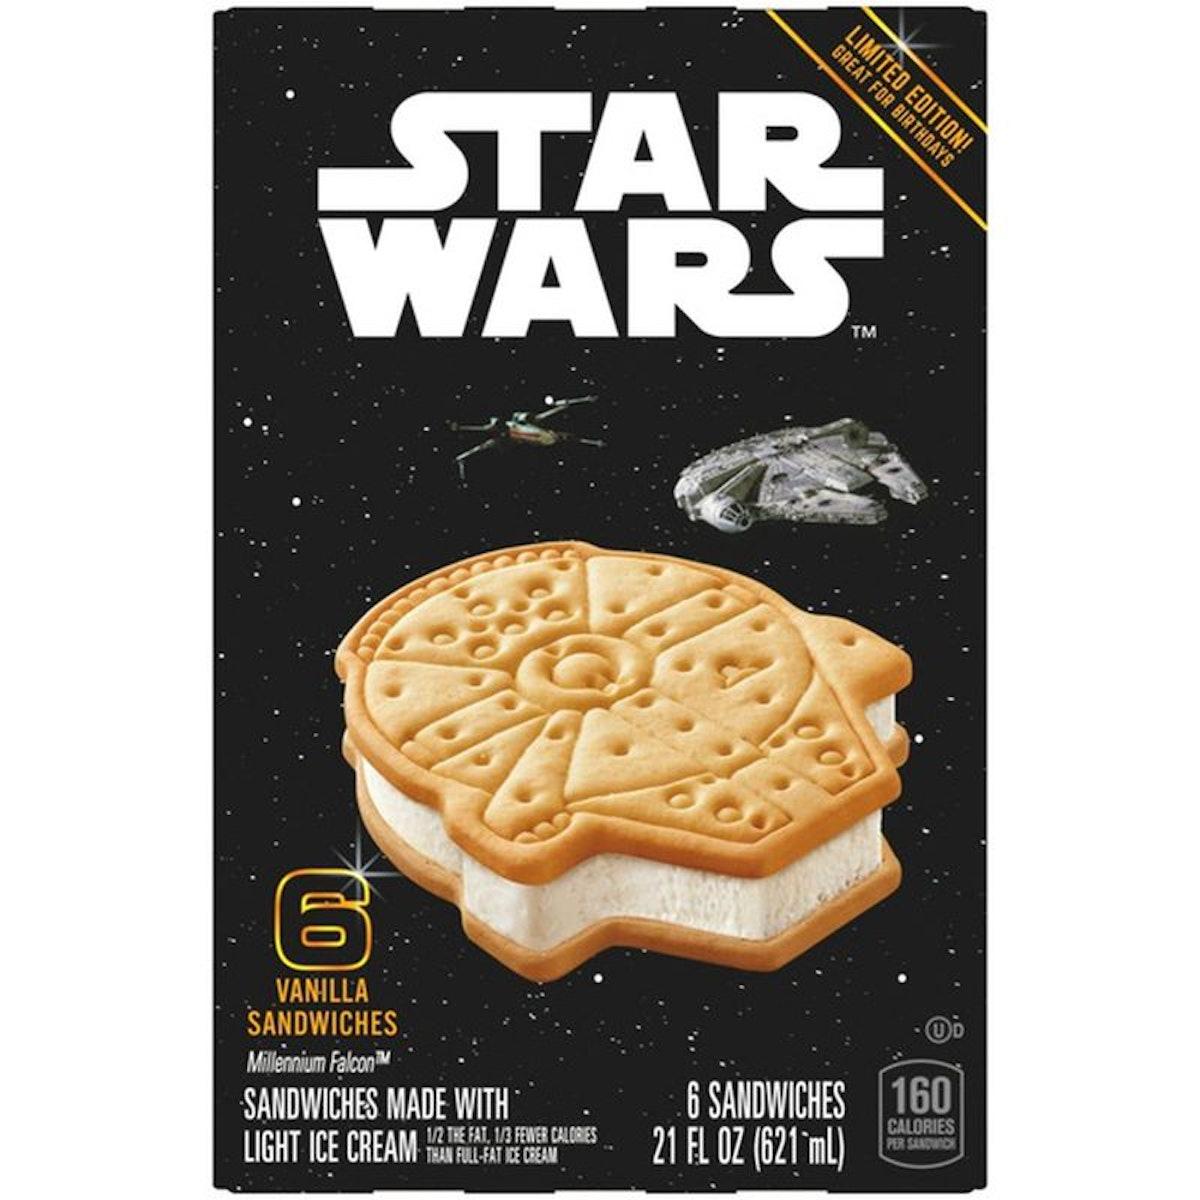 Star Wars Limited Edition Ice Cream Sandwiches